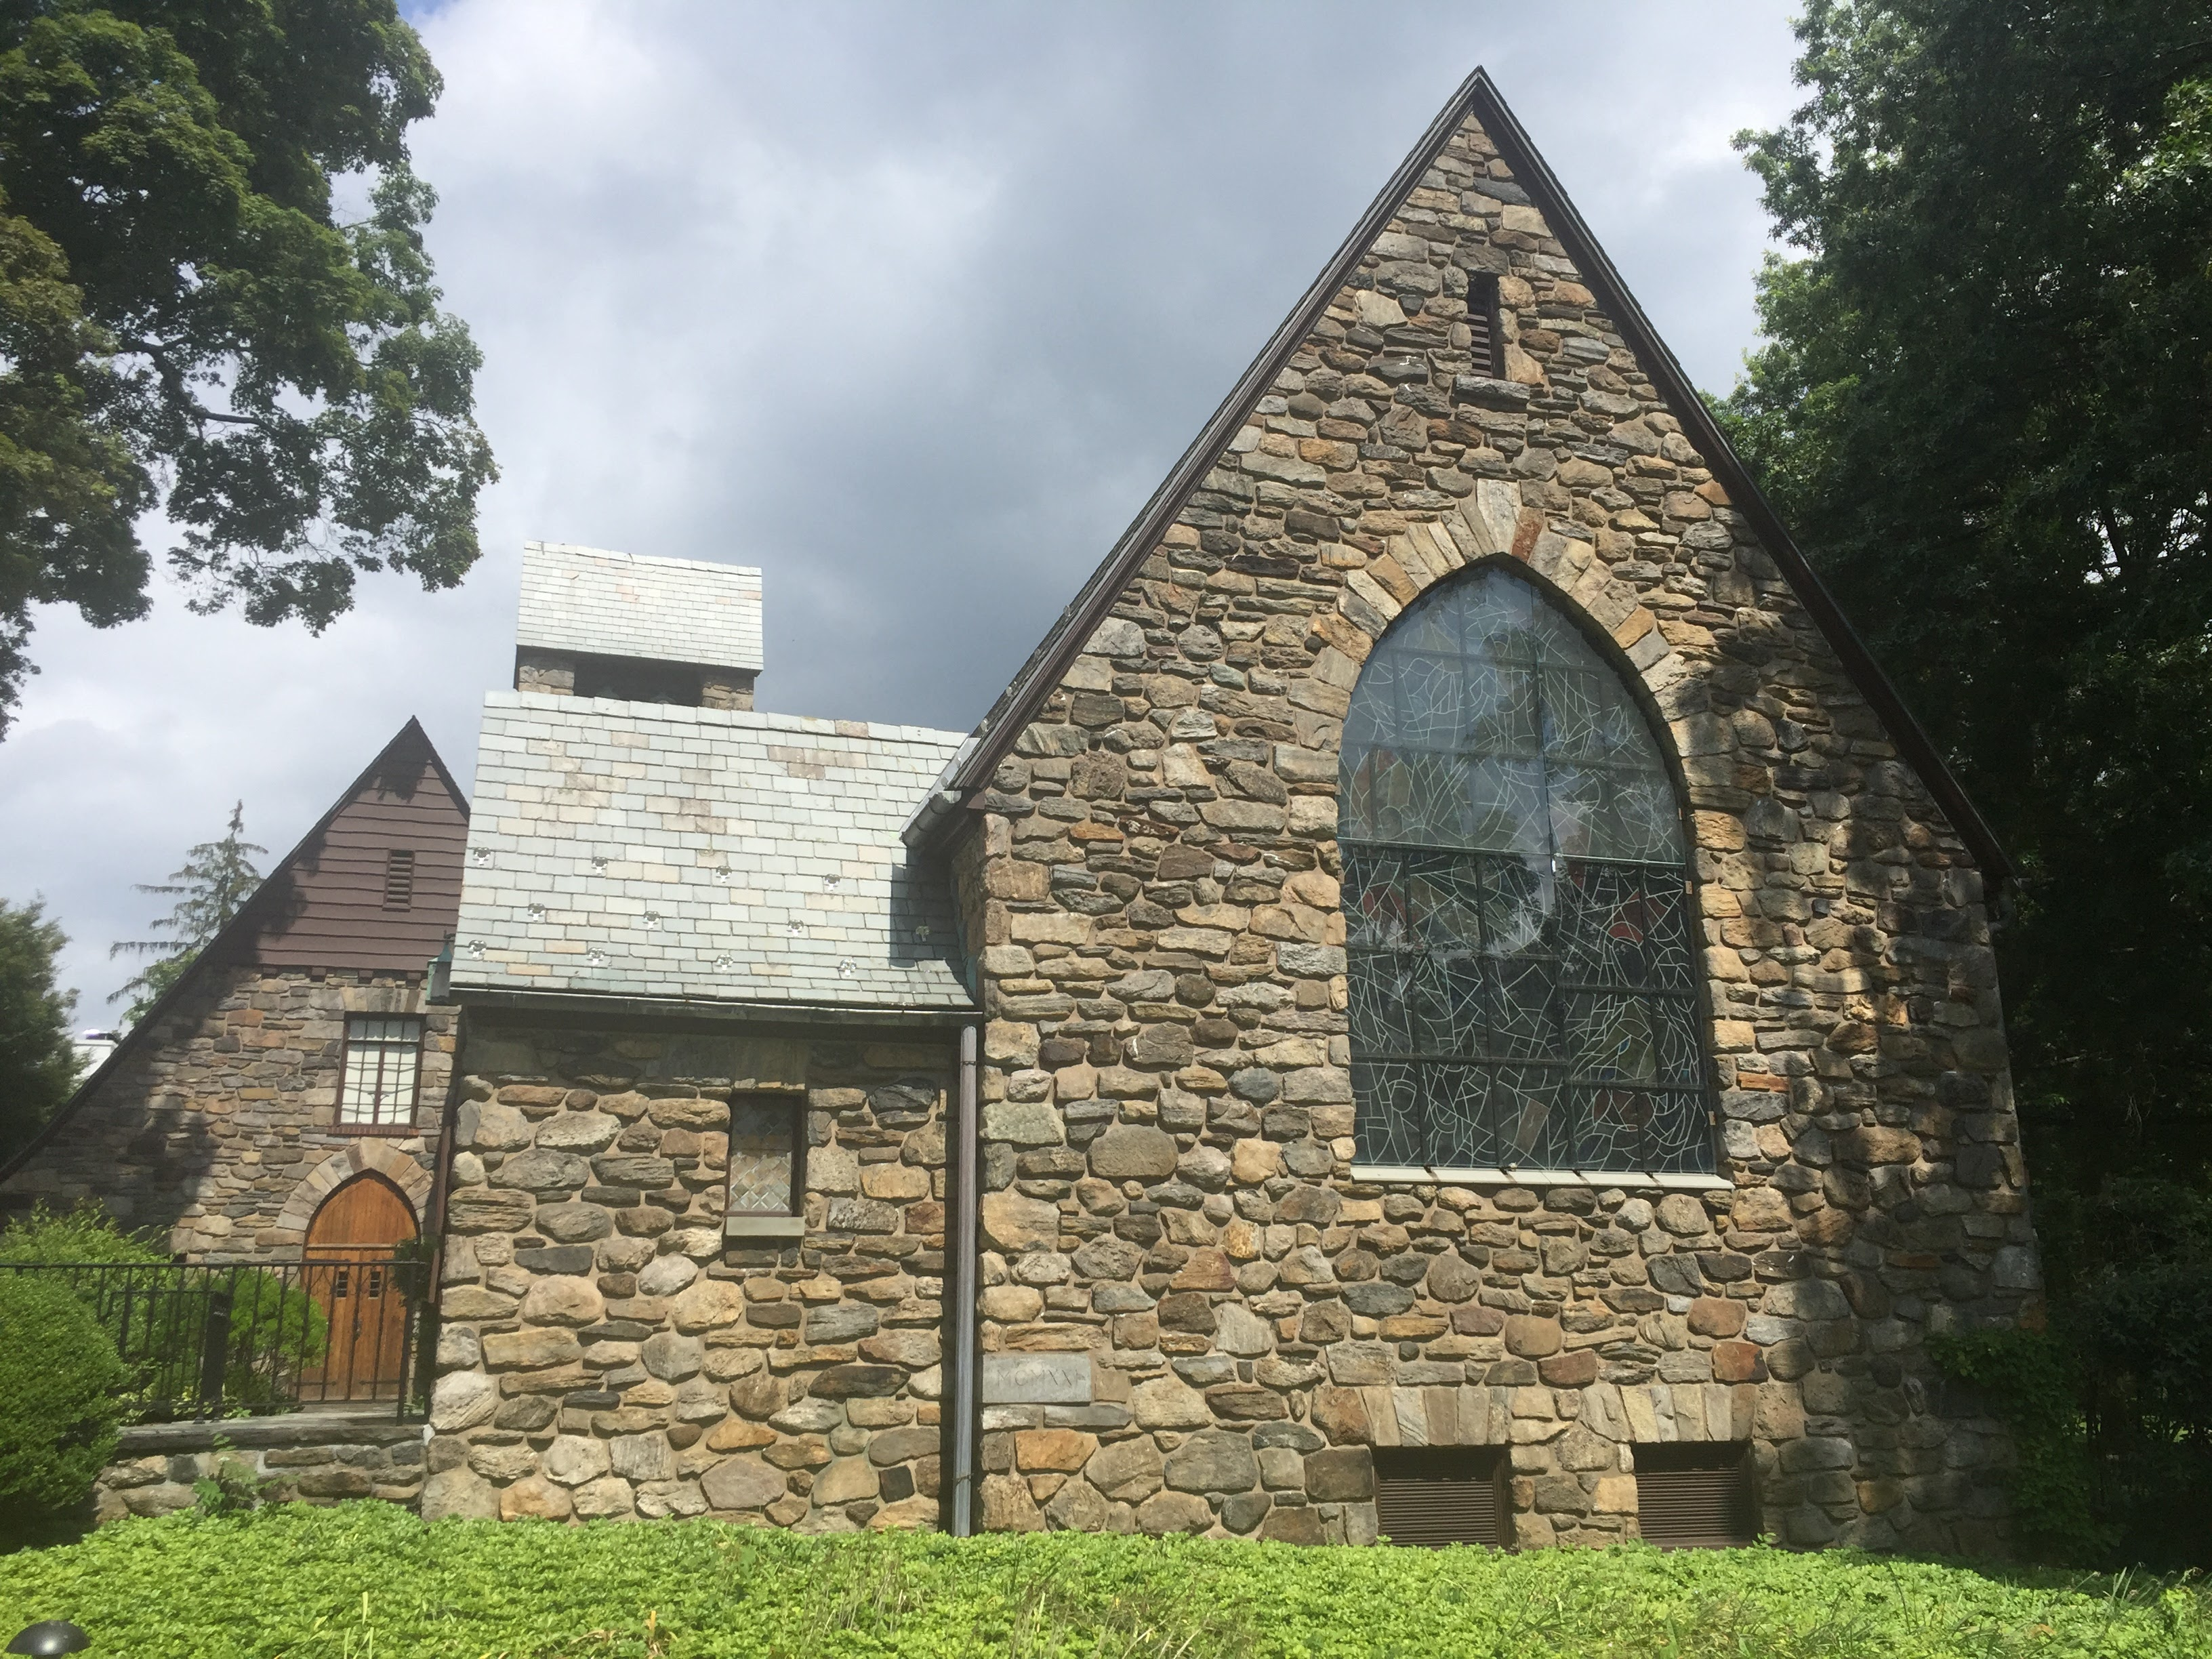 2017-07-01 Union Church.jpg